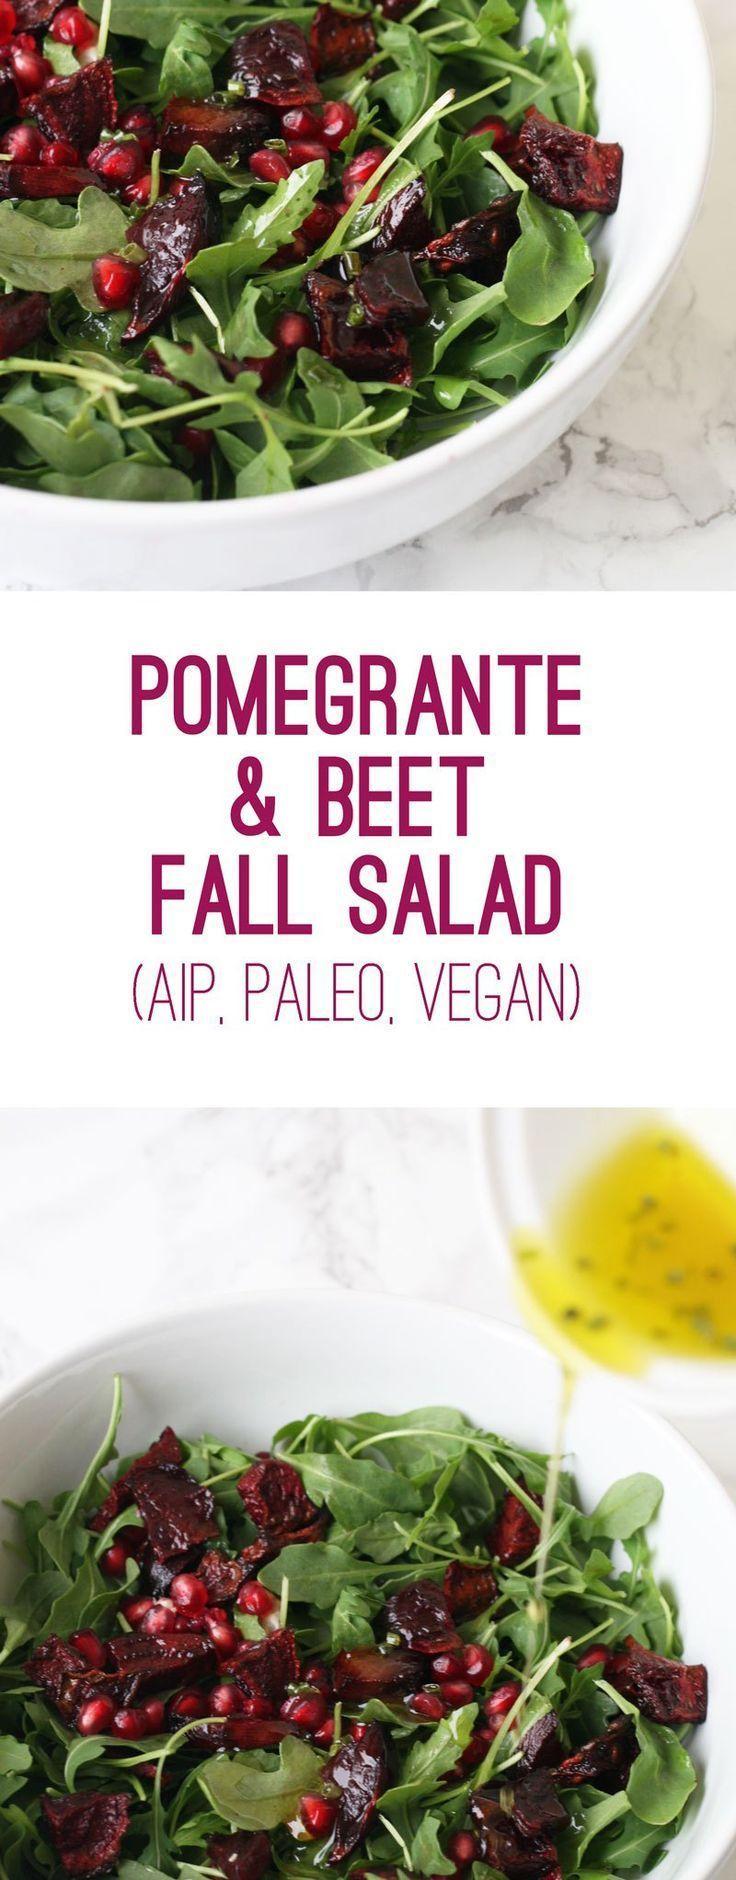 Pomegranate Beet Fall Salad (AIP, Paleo, Vegan)